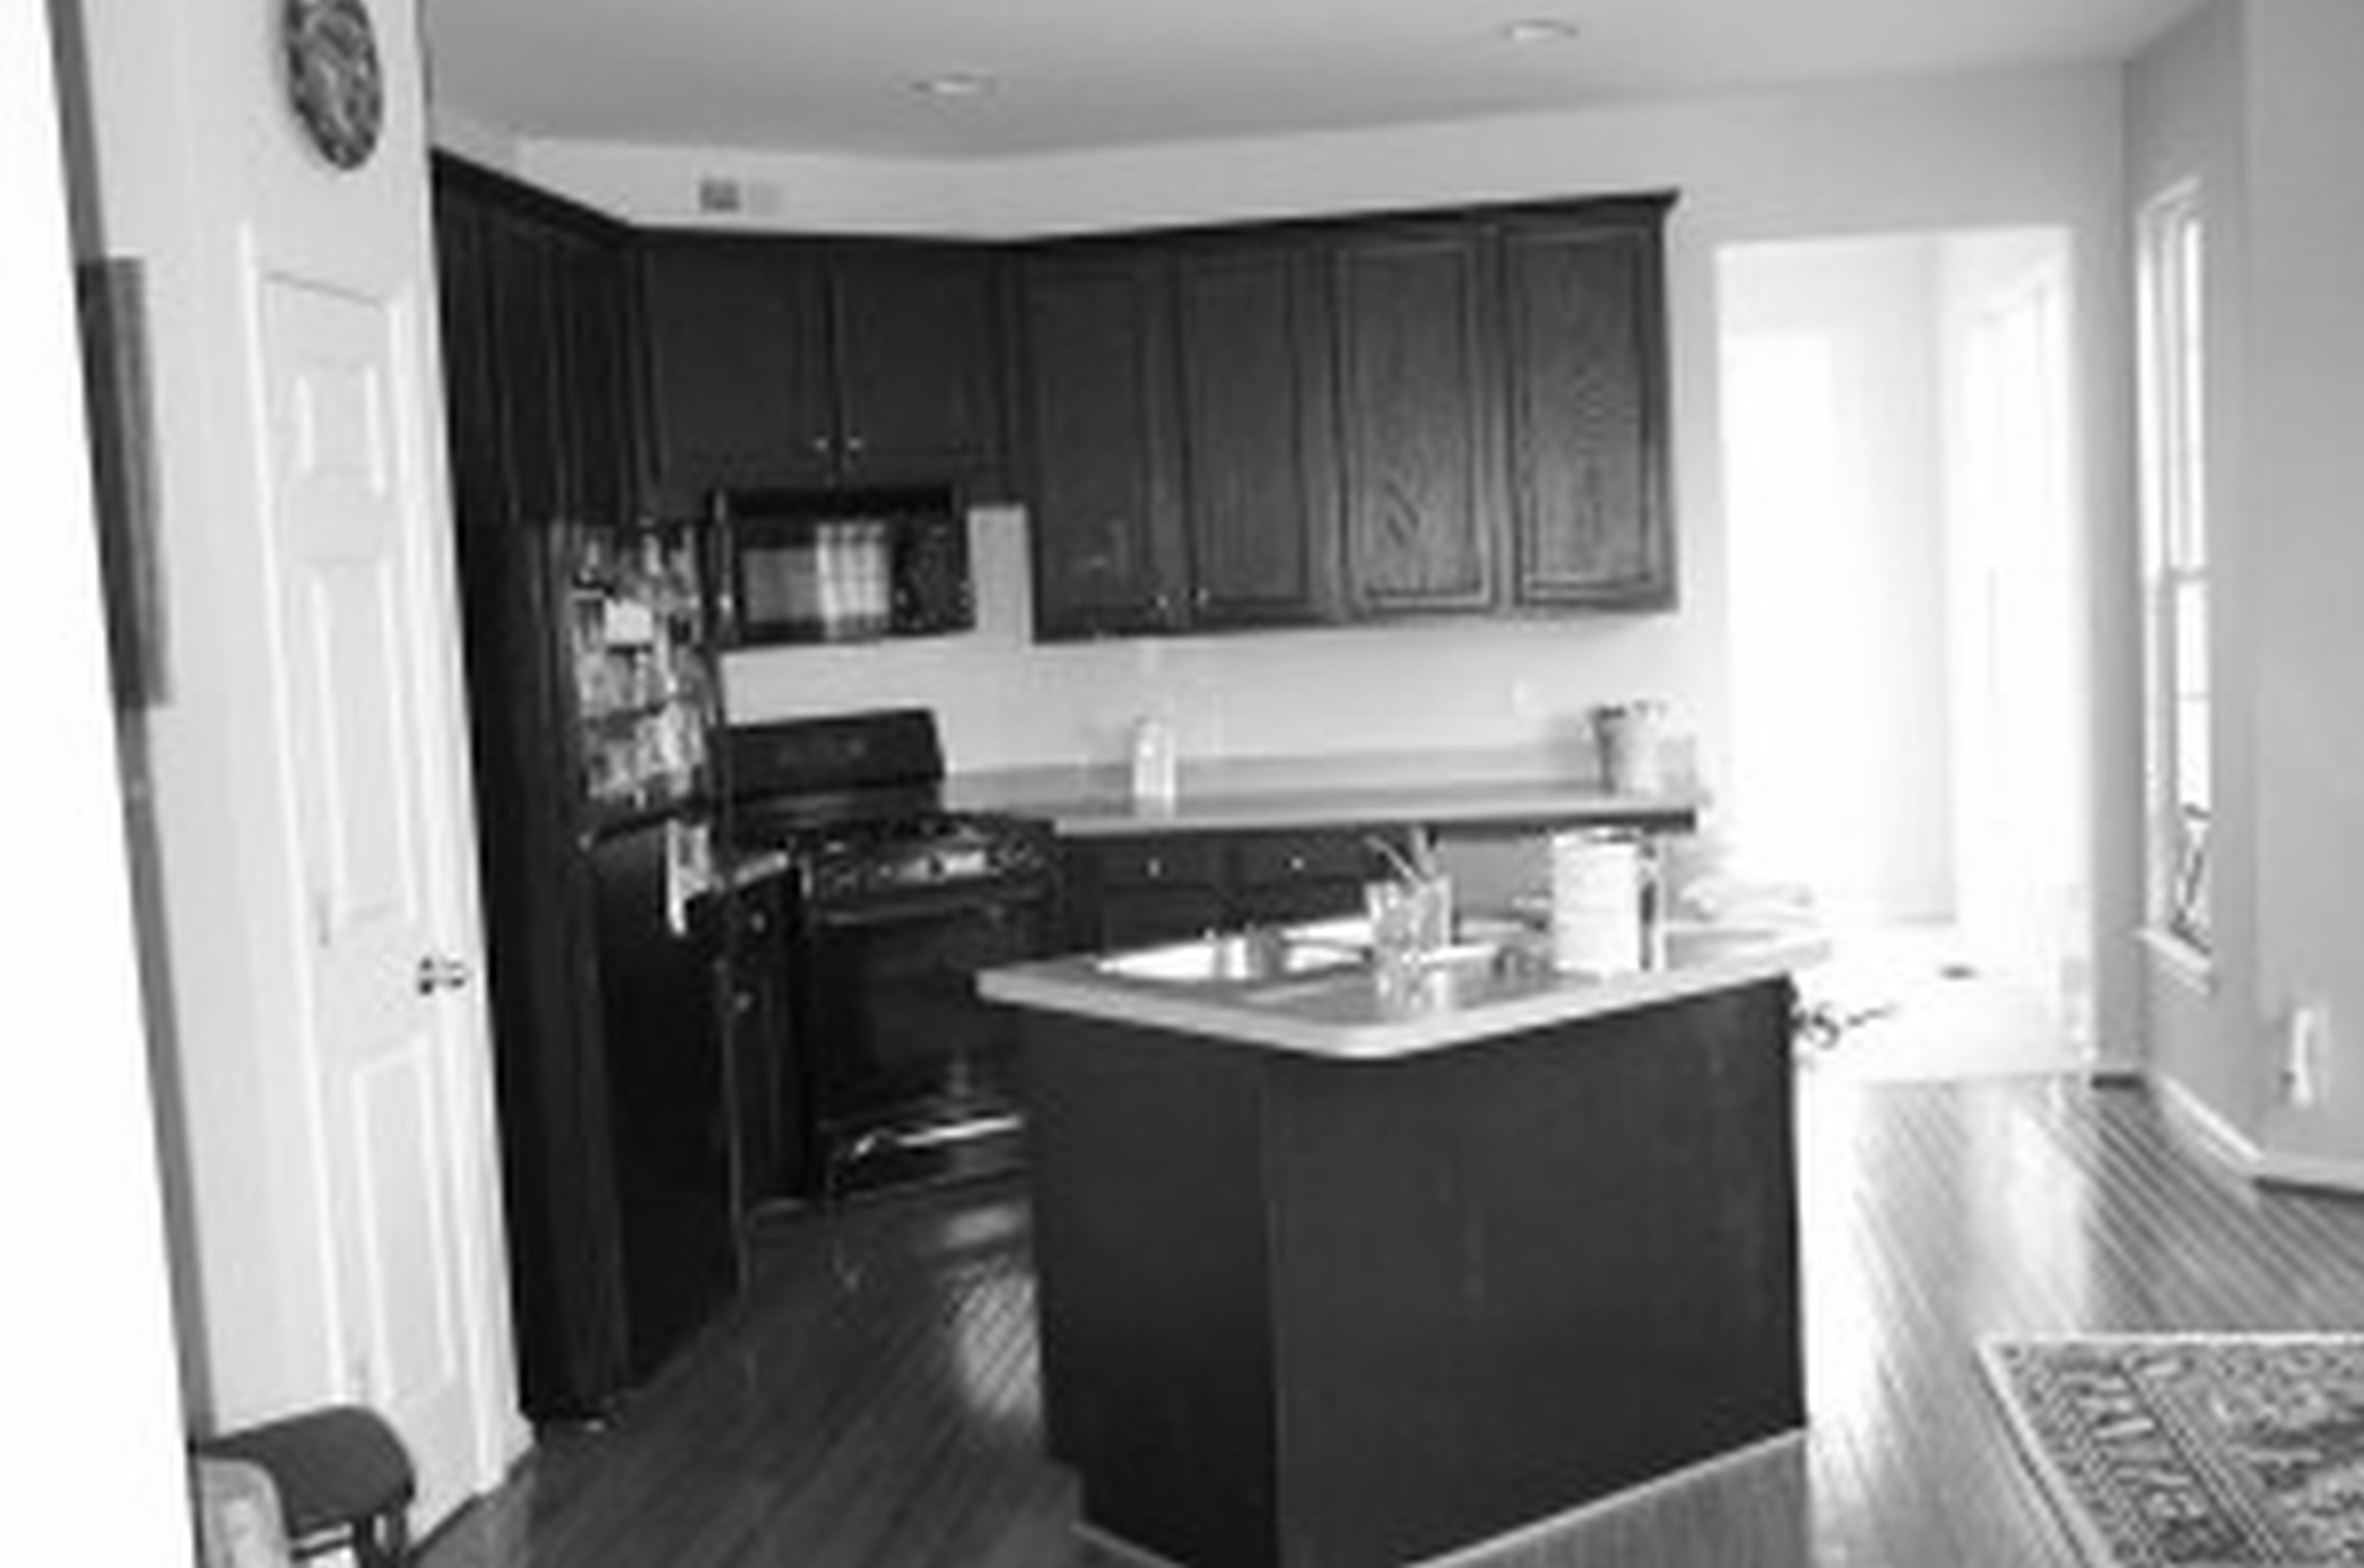 Kitchens with Dark Cabinets and Black Appliances, black kitchen ...